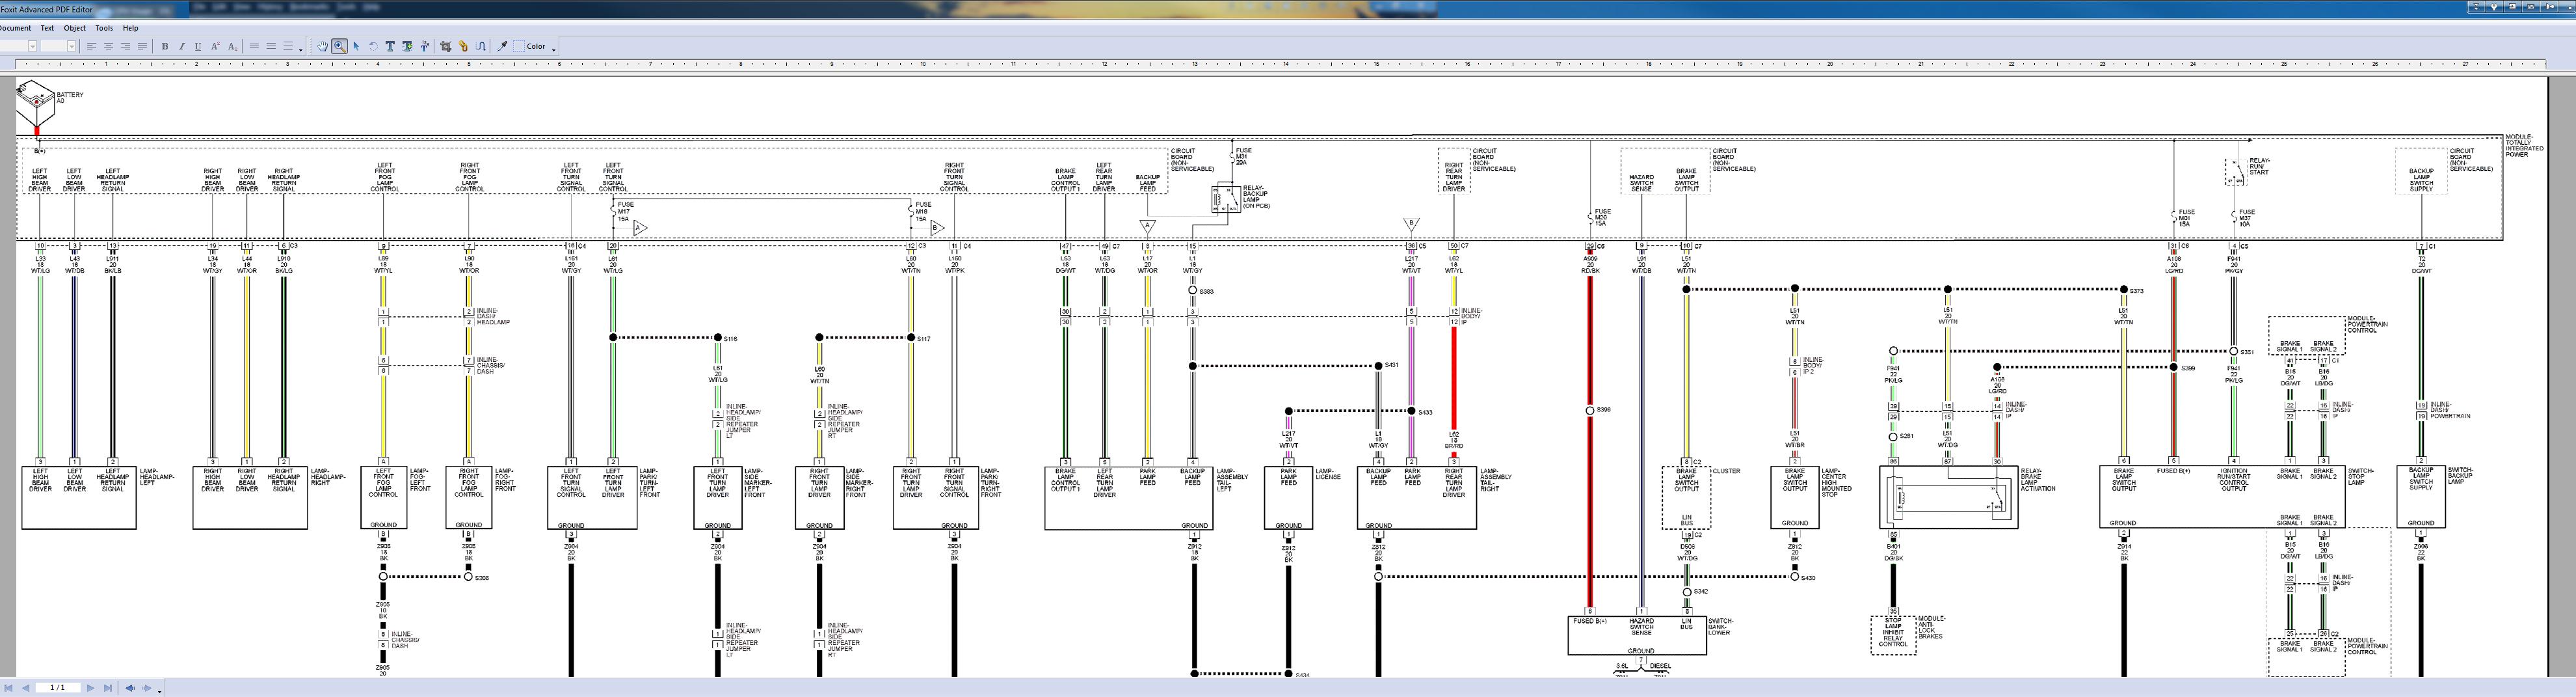 brake light switch wiring diagram 2018 wrangler brake switch wiring jeep wrangler forum brake light switch wiring schematic 2018 wrangler brake switch wiring